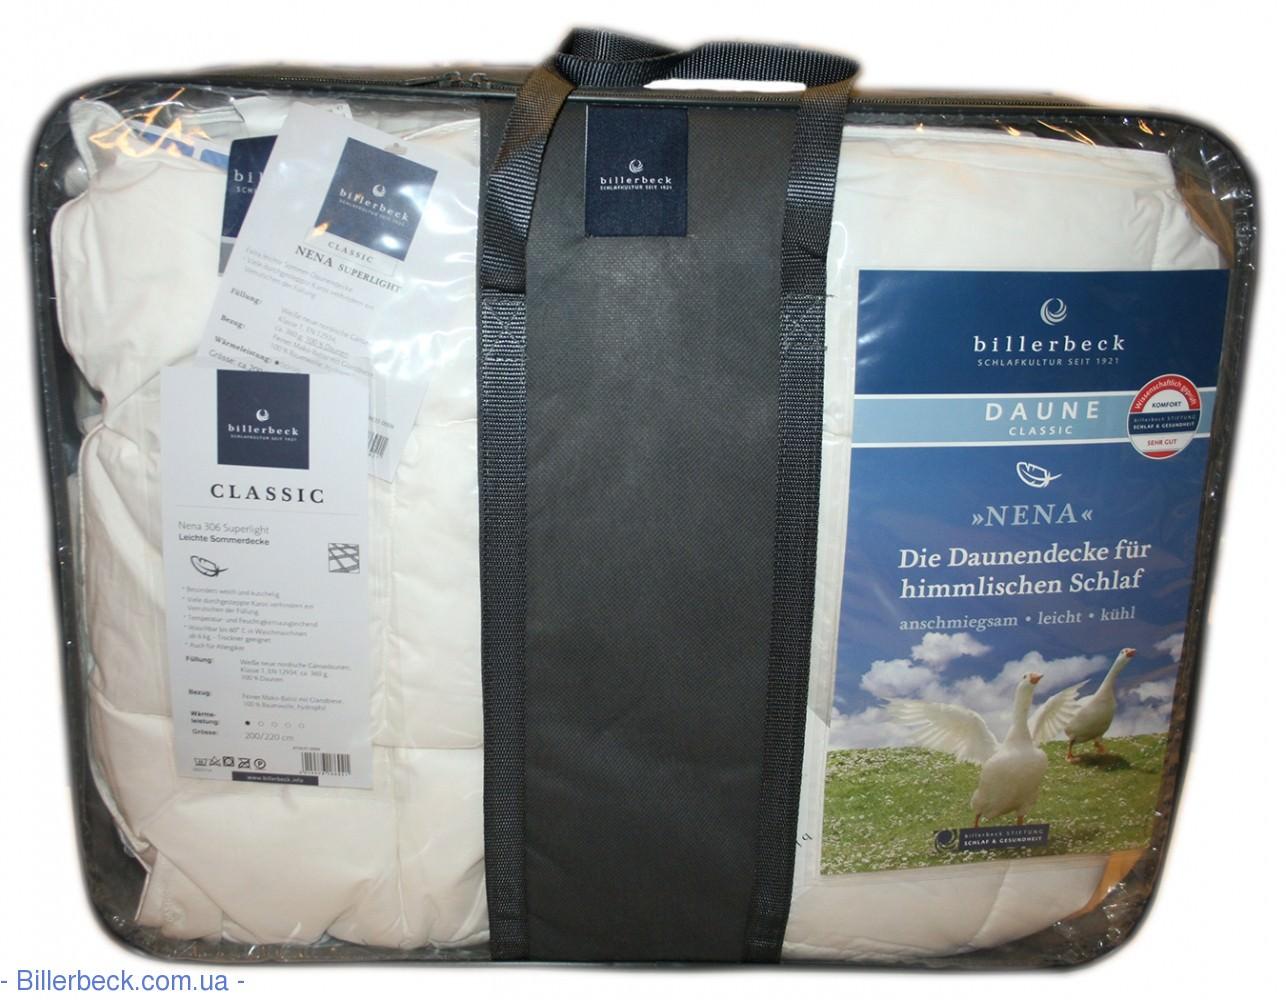 Пуховое одеяло NENA SUPERLIGHT 306 (Billerbeck Германия) - 1